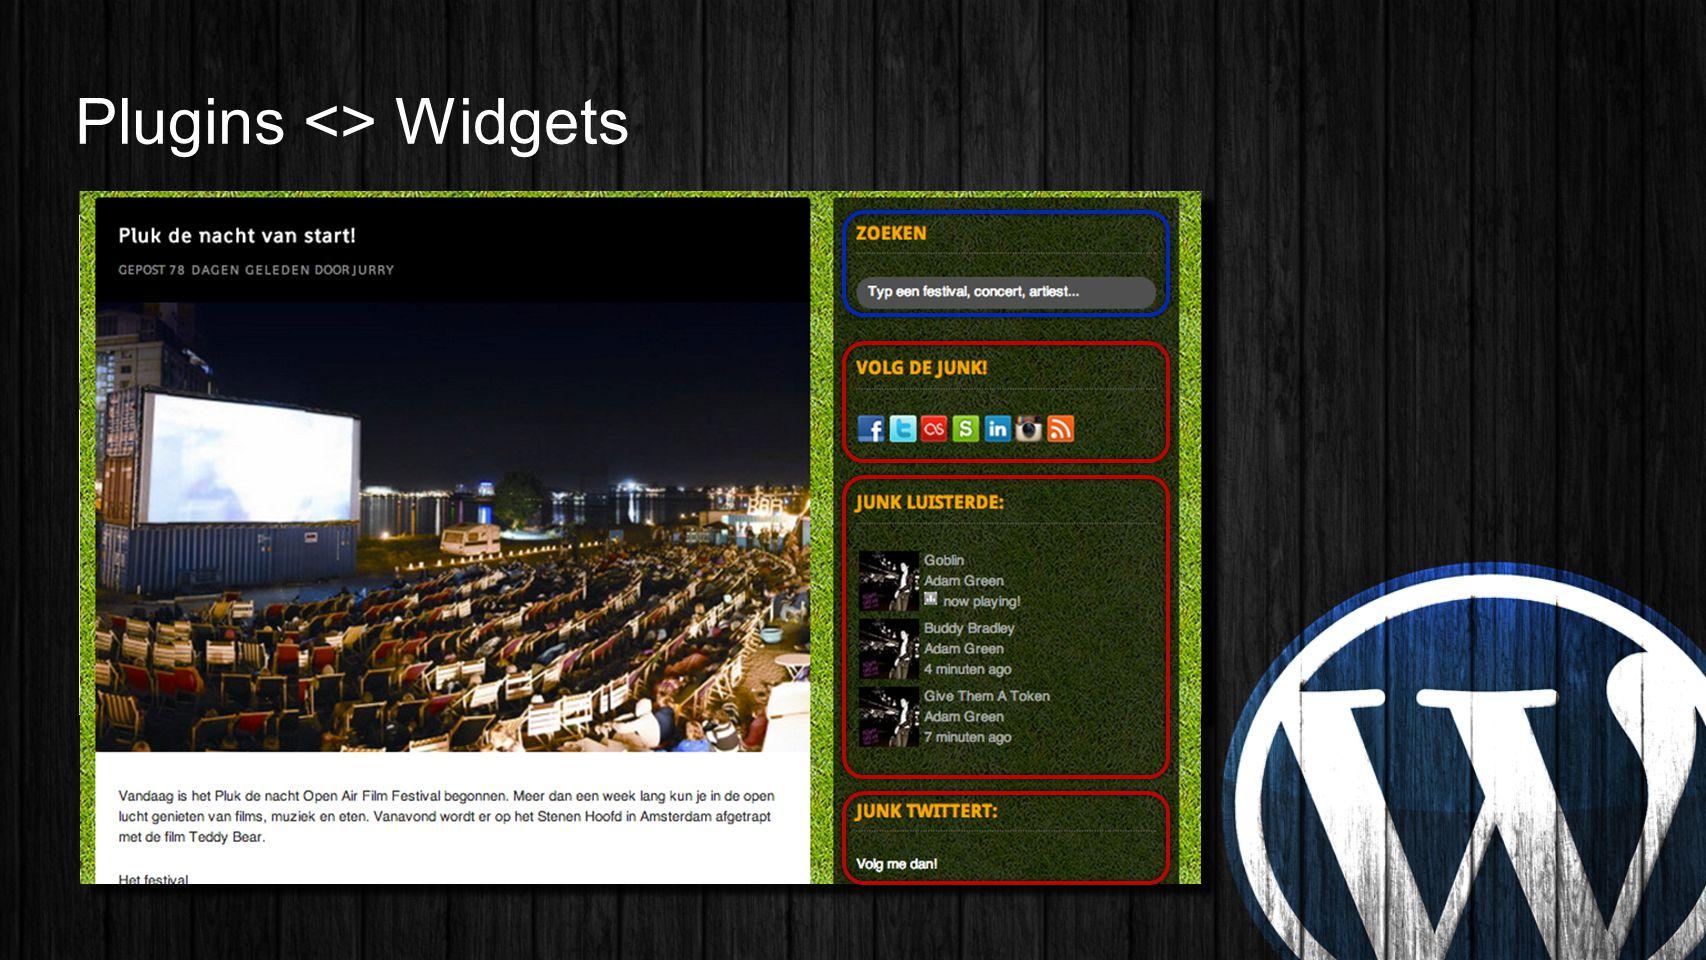 Plugins <> Widgets